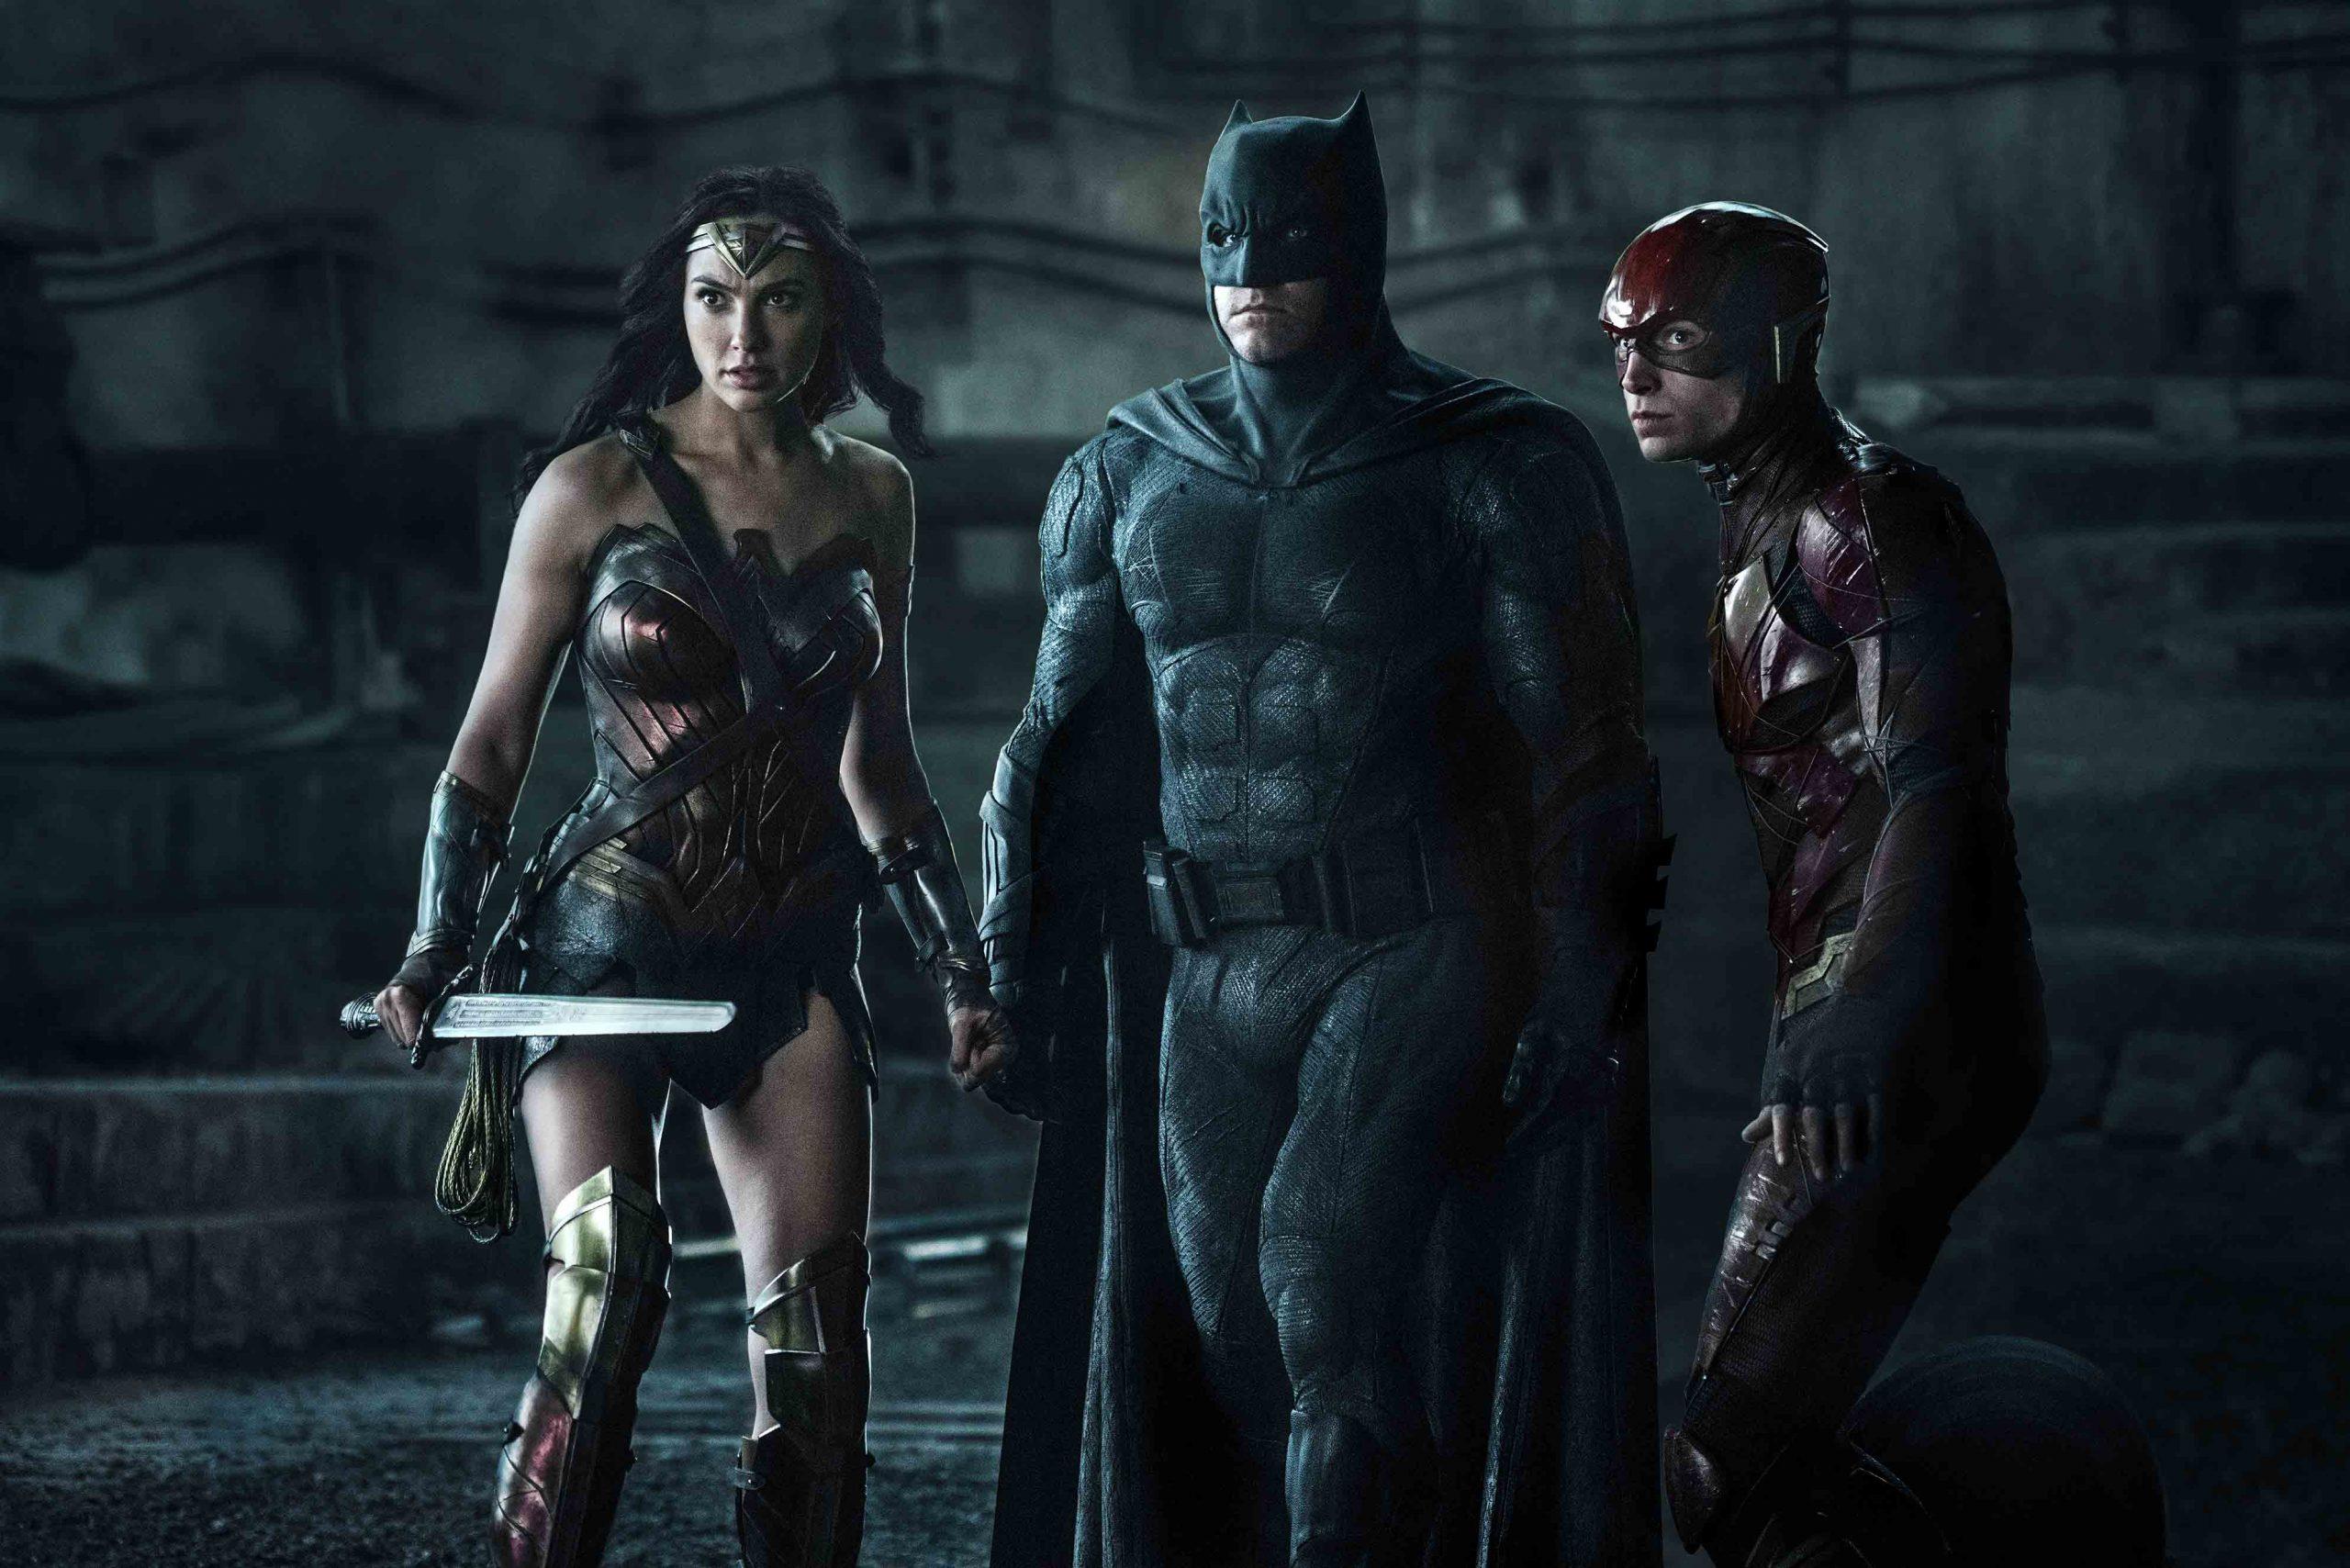 Mulher-Maravilha (Gal Gadot), Batman (Ben Affleck) e Flash (Ezra Miller) em Liga da Justiça